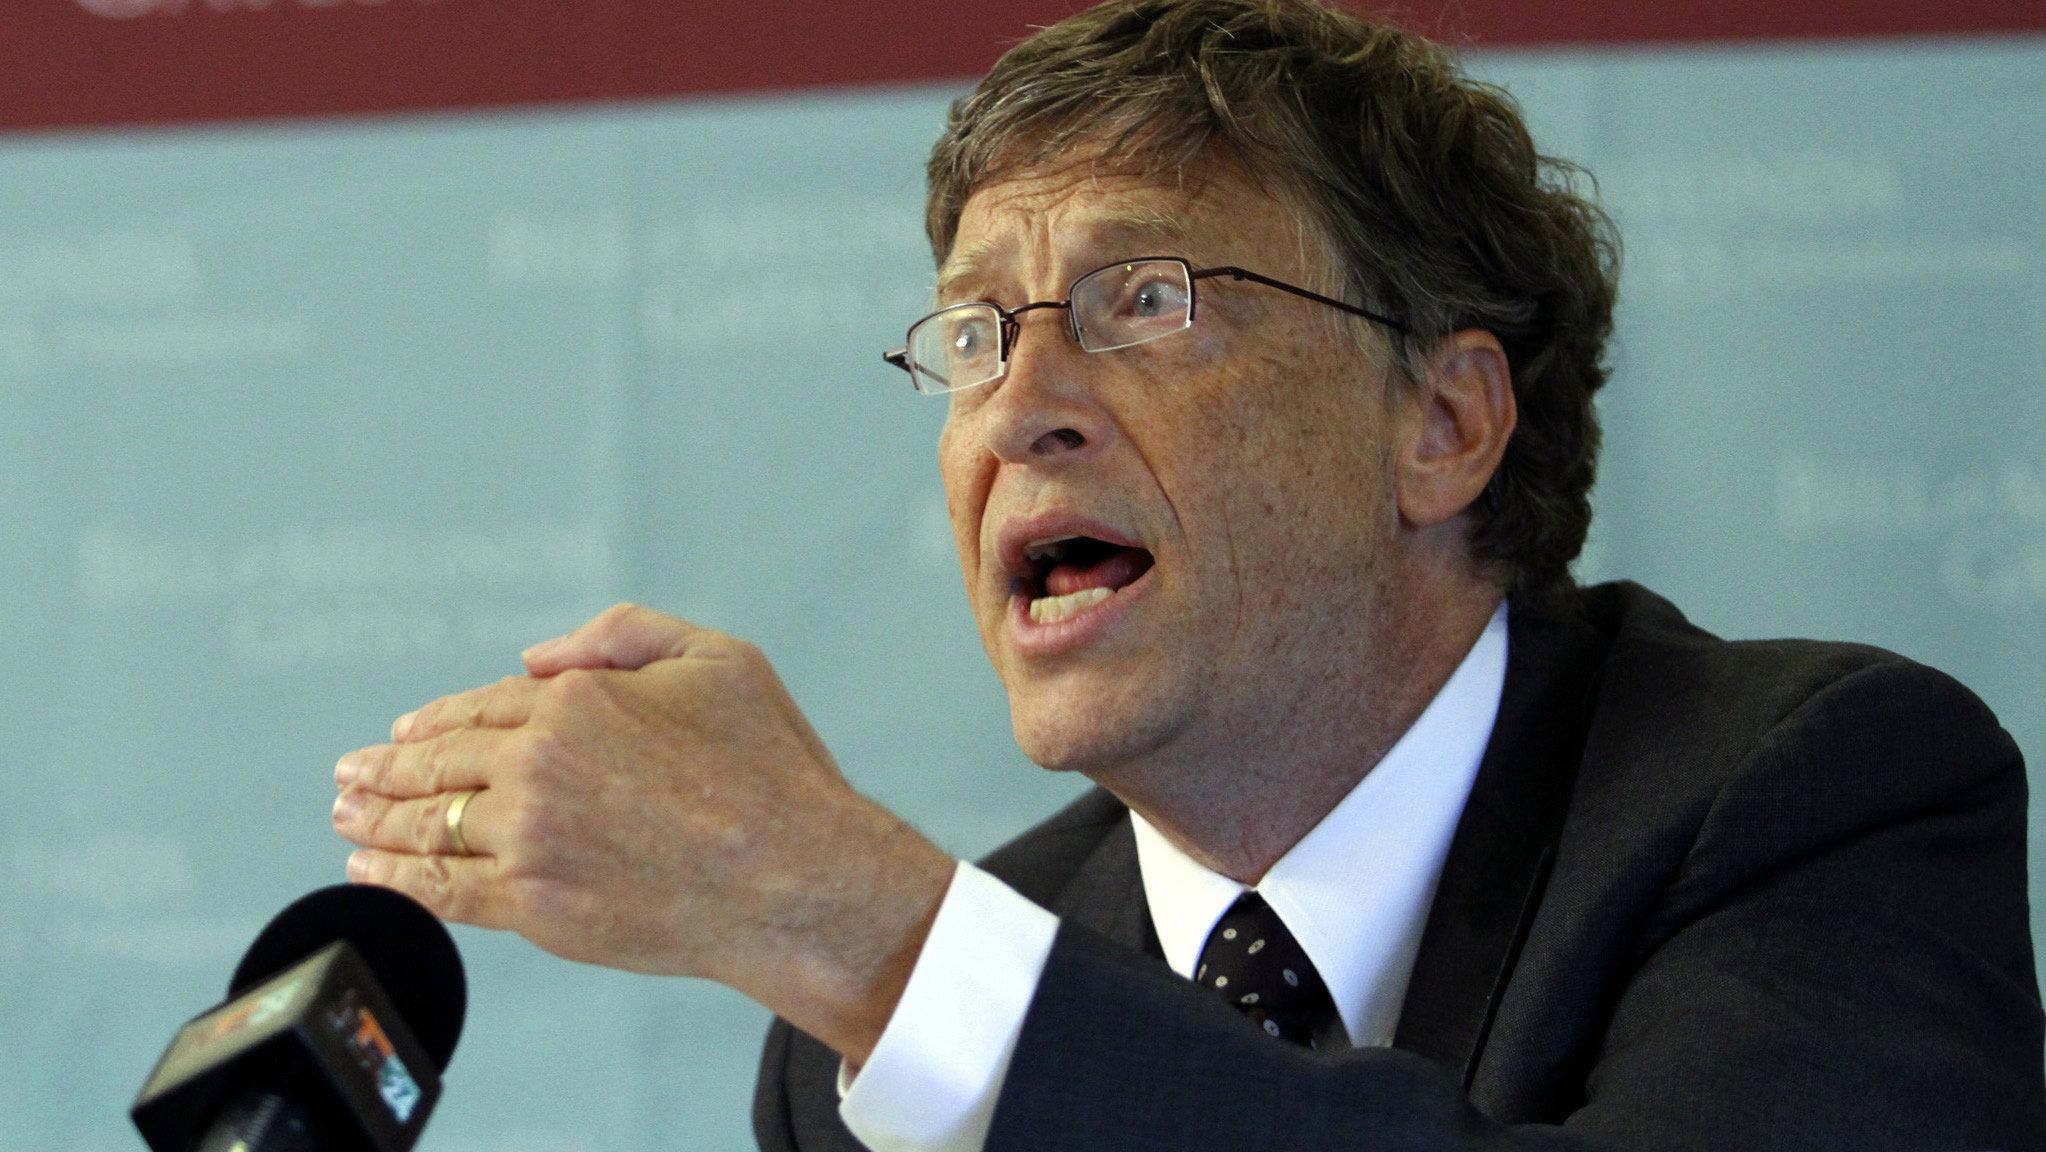 Bill Gates speech in Nigeria criticizes Nigerian government